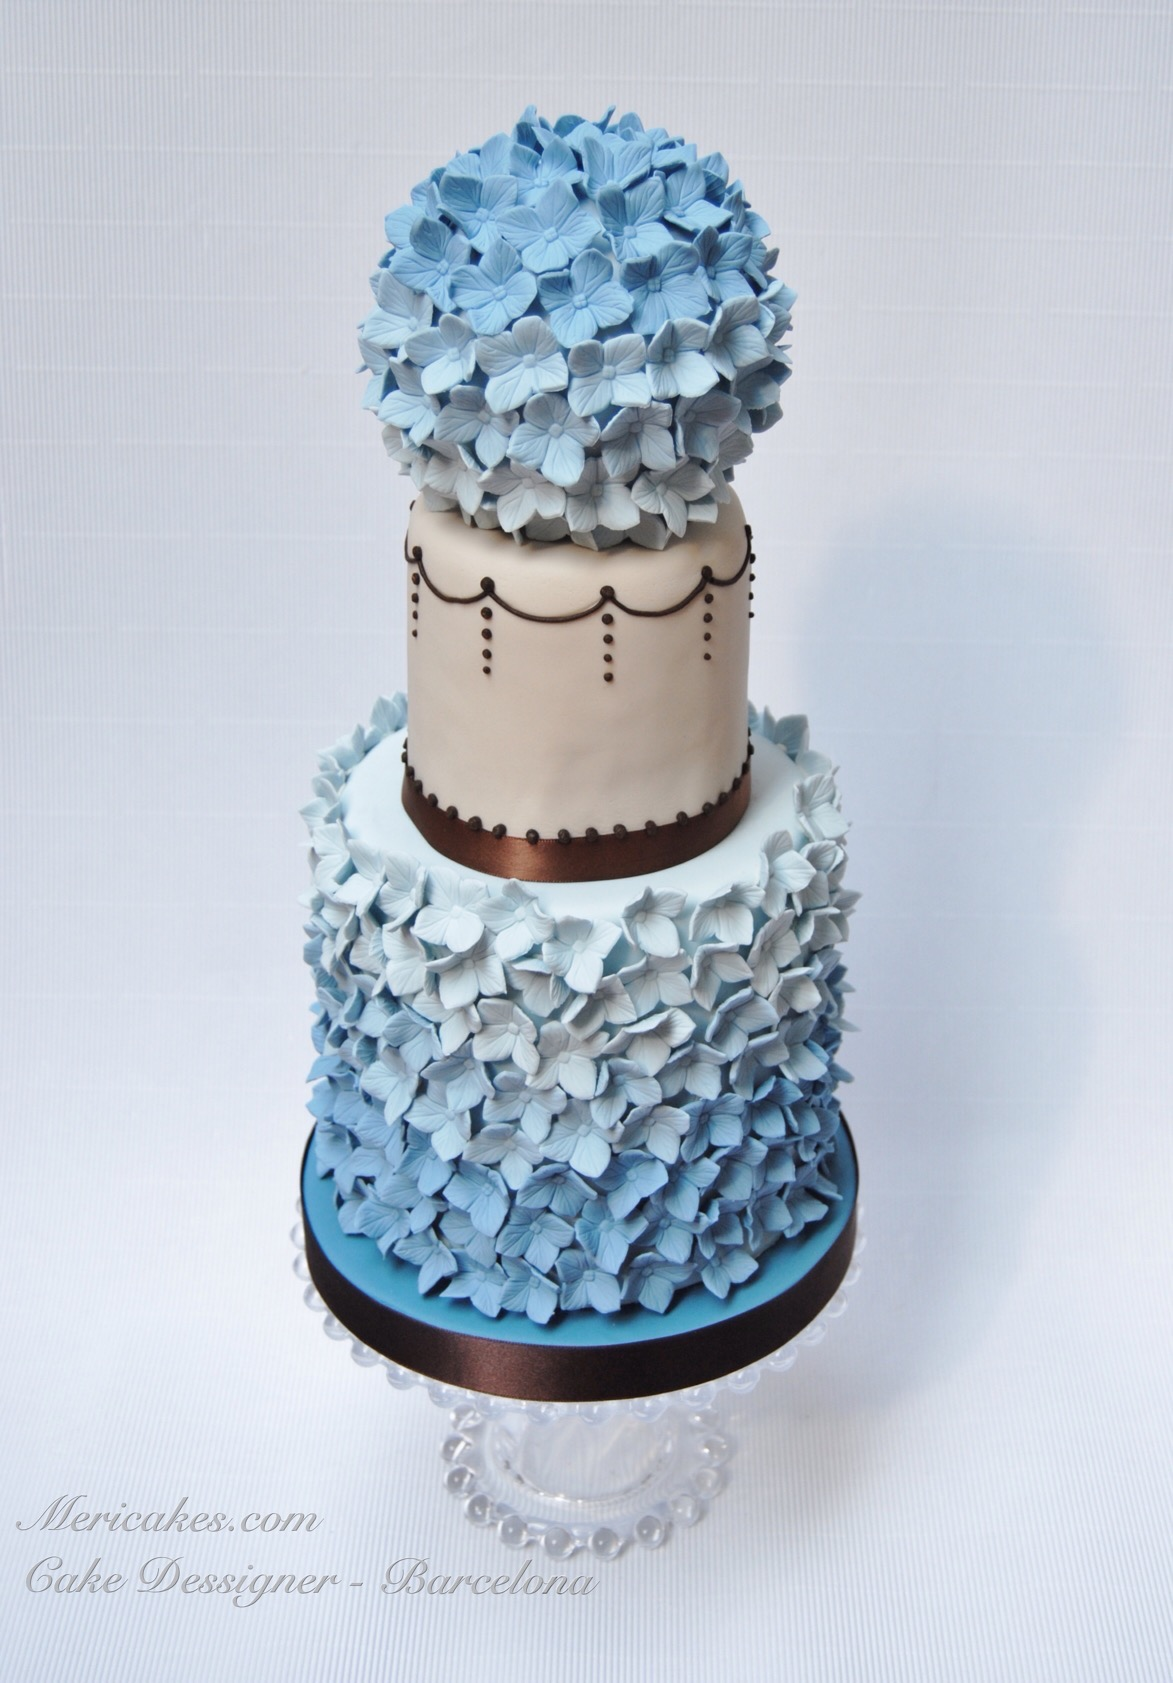 wedding-cake-tarta-de-boda-fondant-pastel-de-boda-hydrangea-hortensias-cake-mericakes-barcelona-bluebell-cake-desi